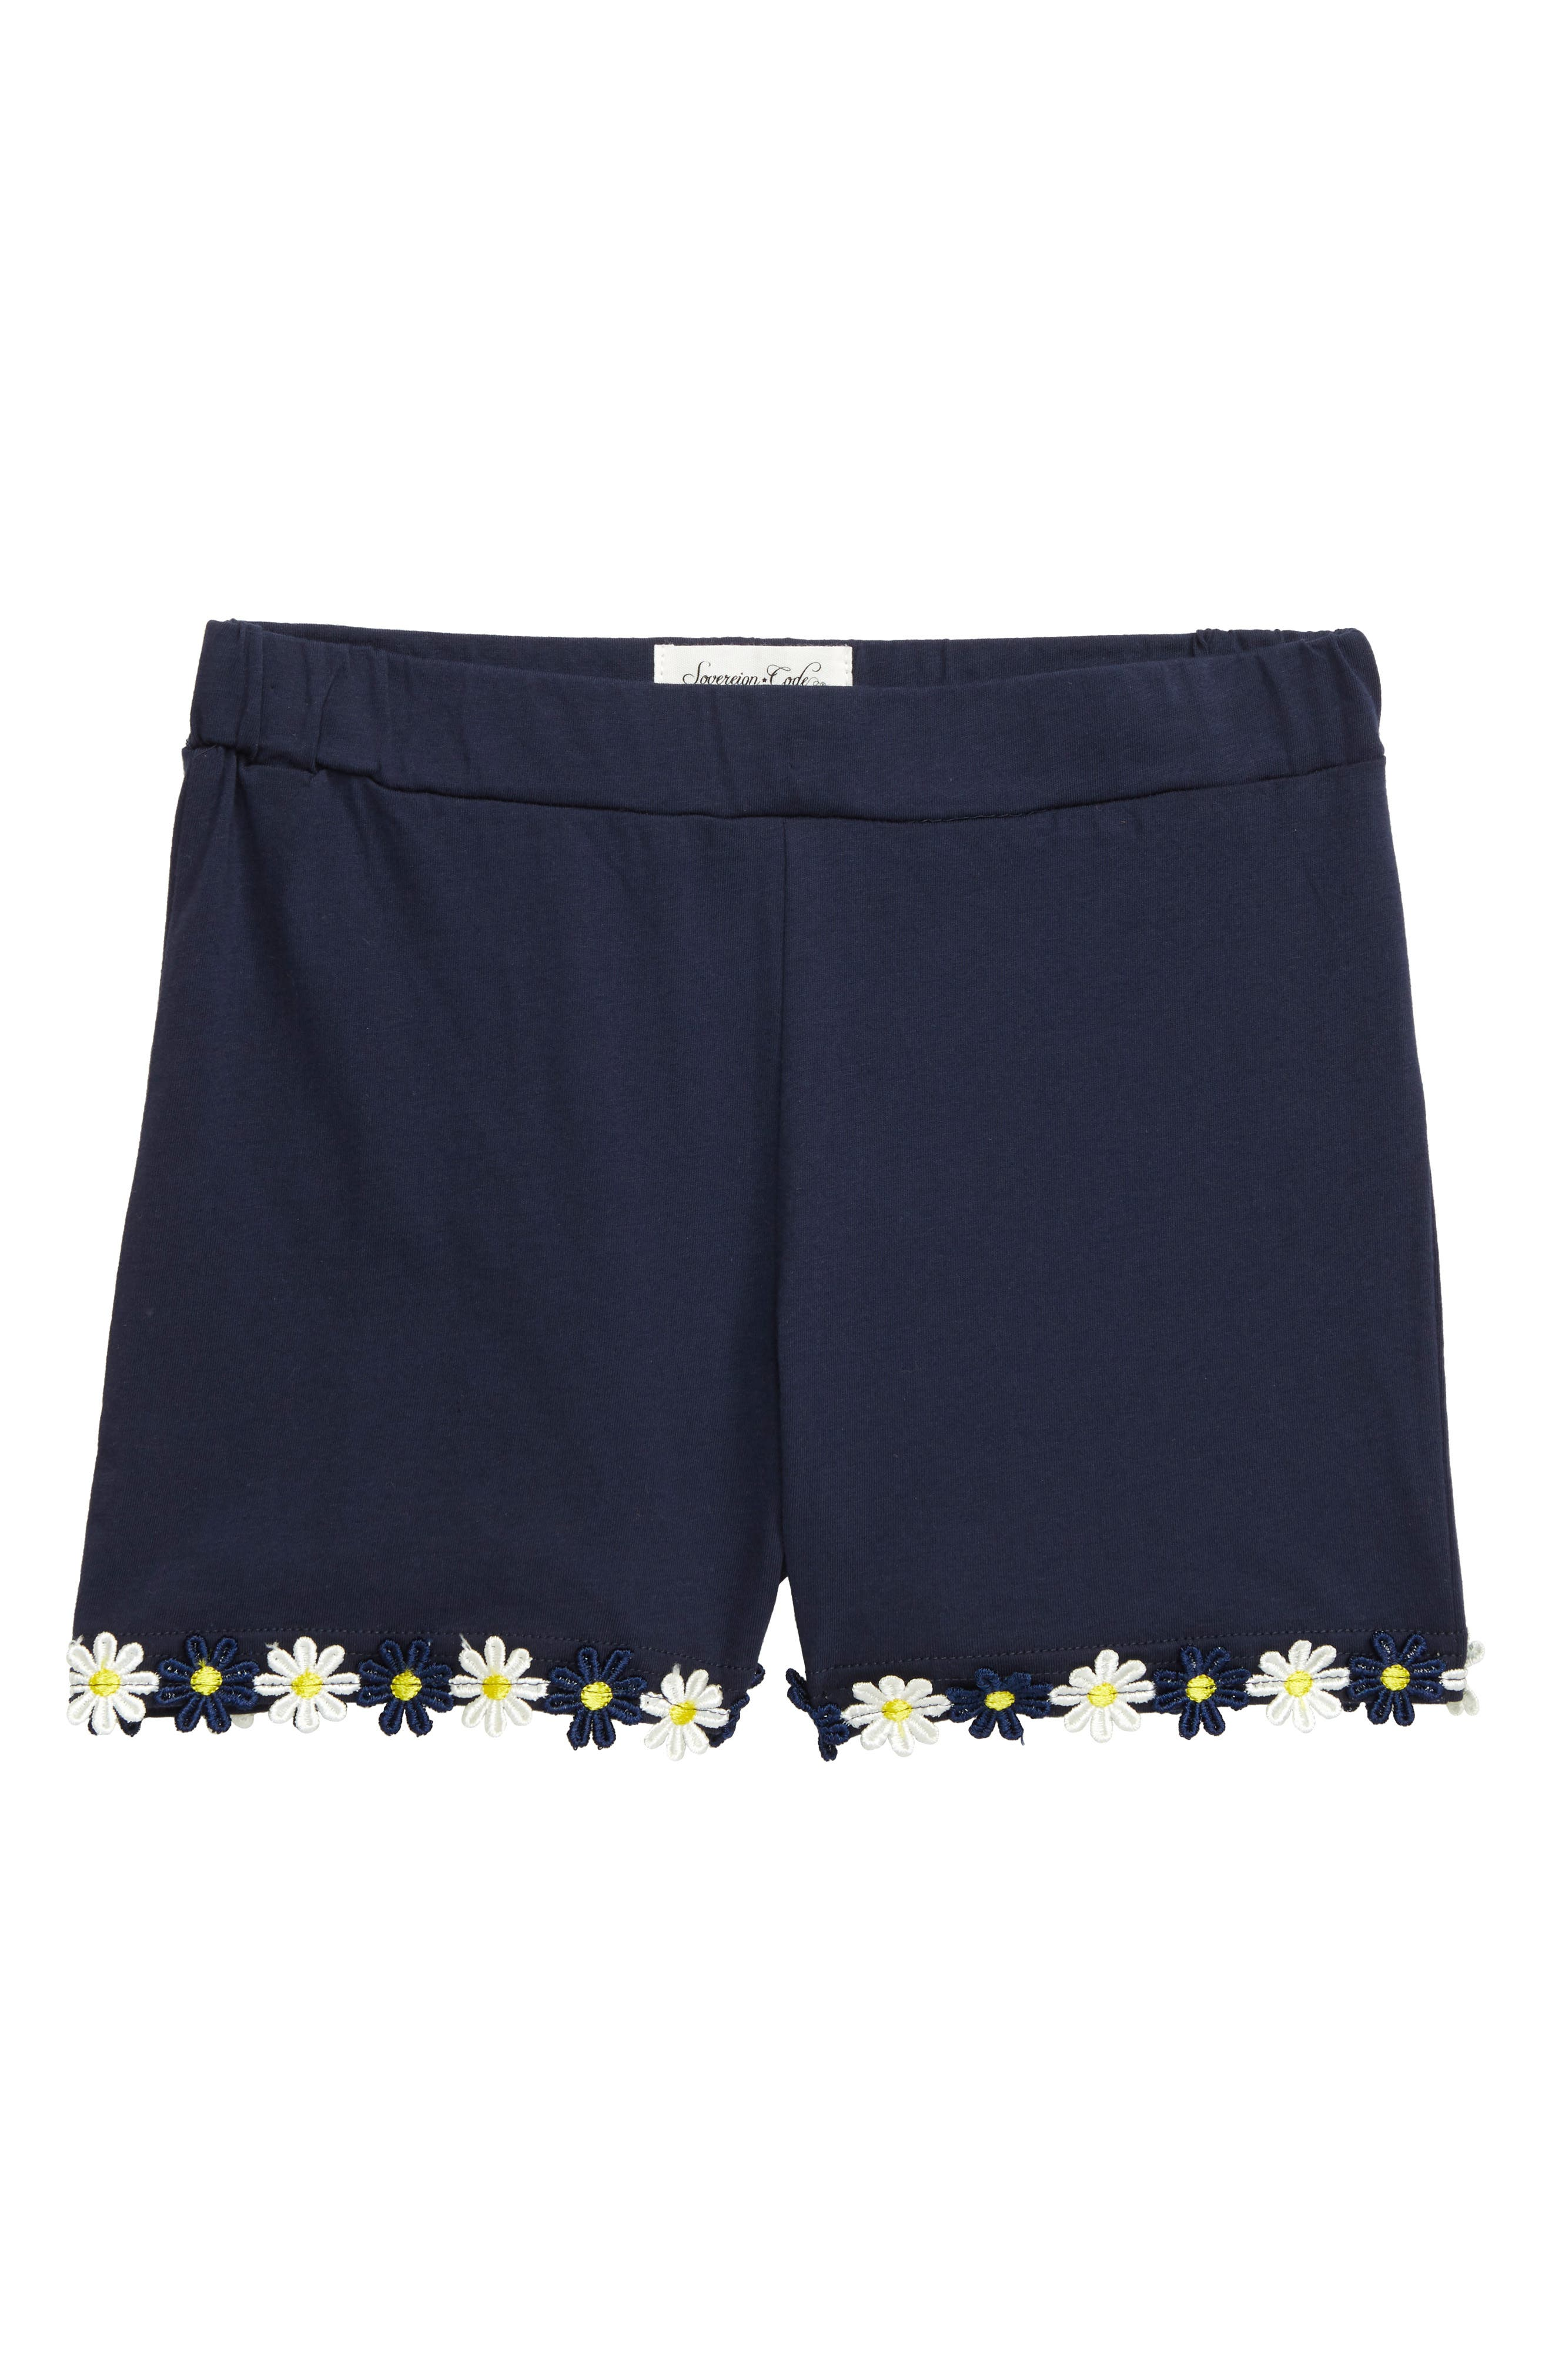 Toddler Girls Sovereign Code Fern Daisy Trim Shorts Size 2T  Blue